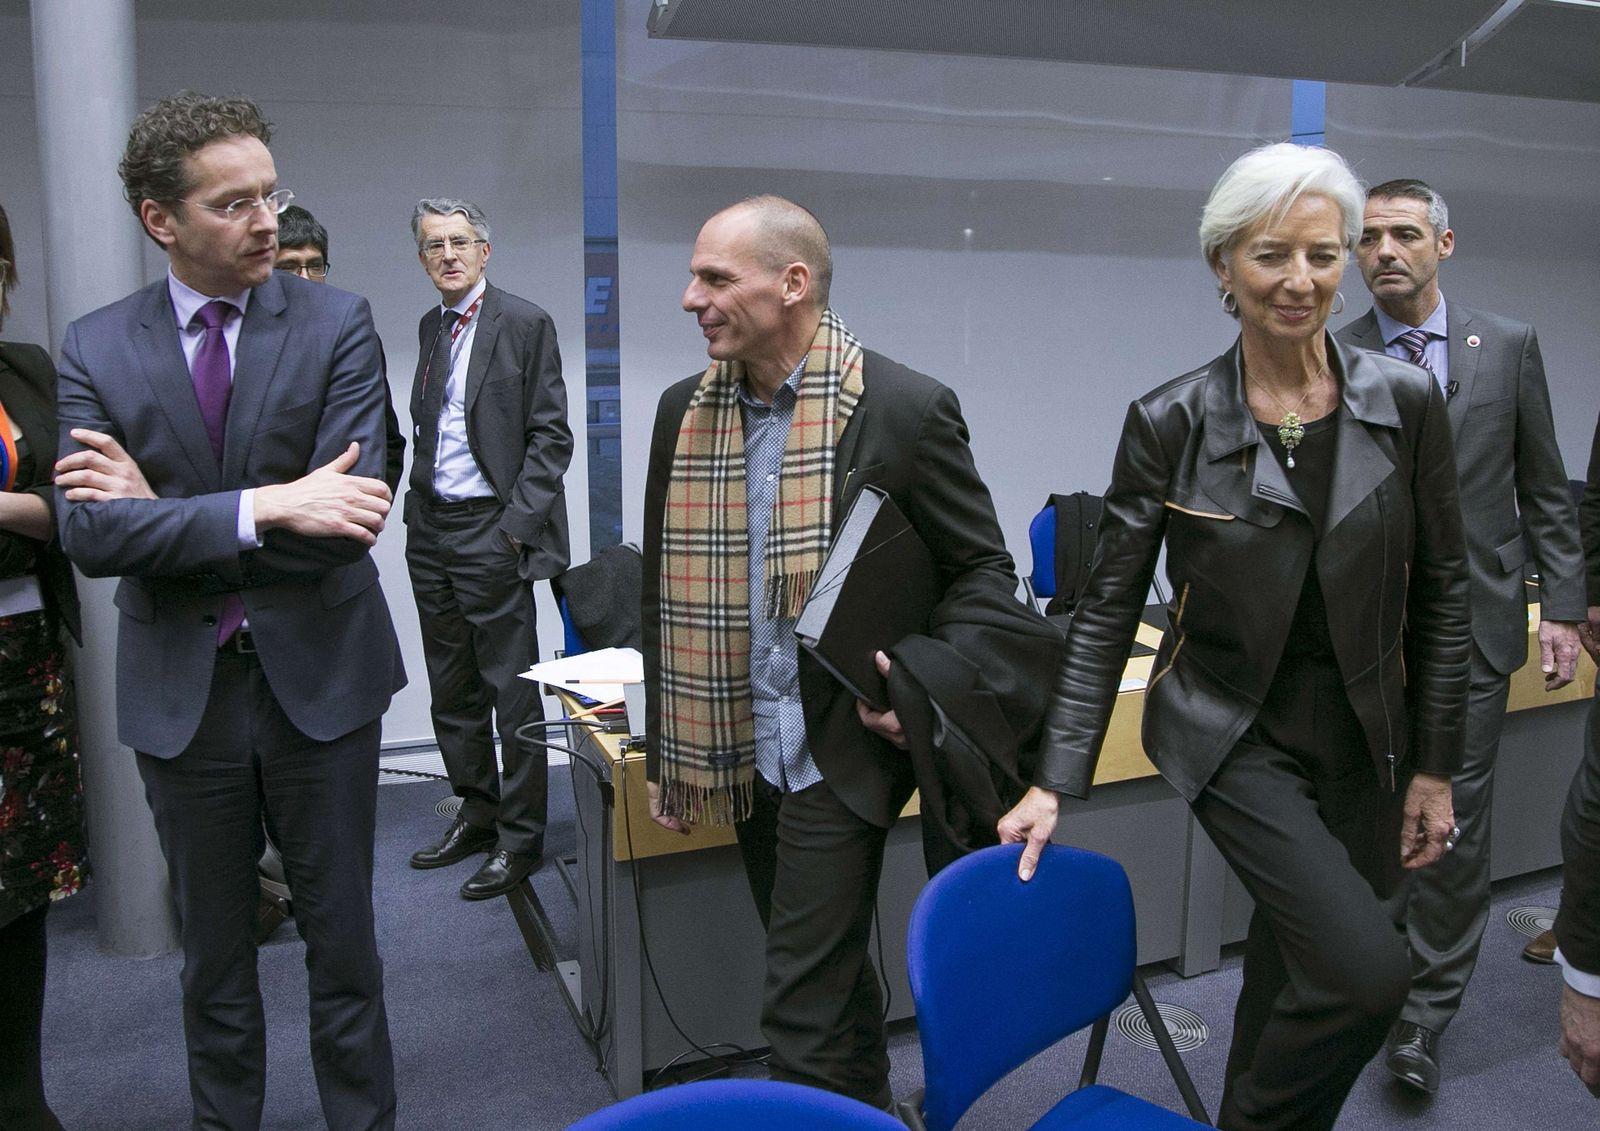 Varoufakis / Dijsselbloem